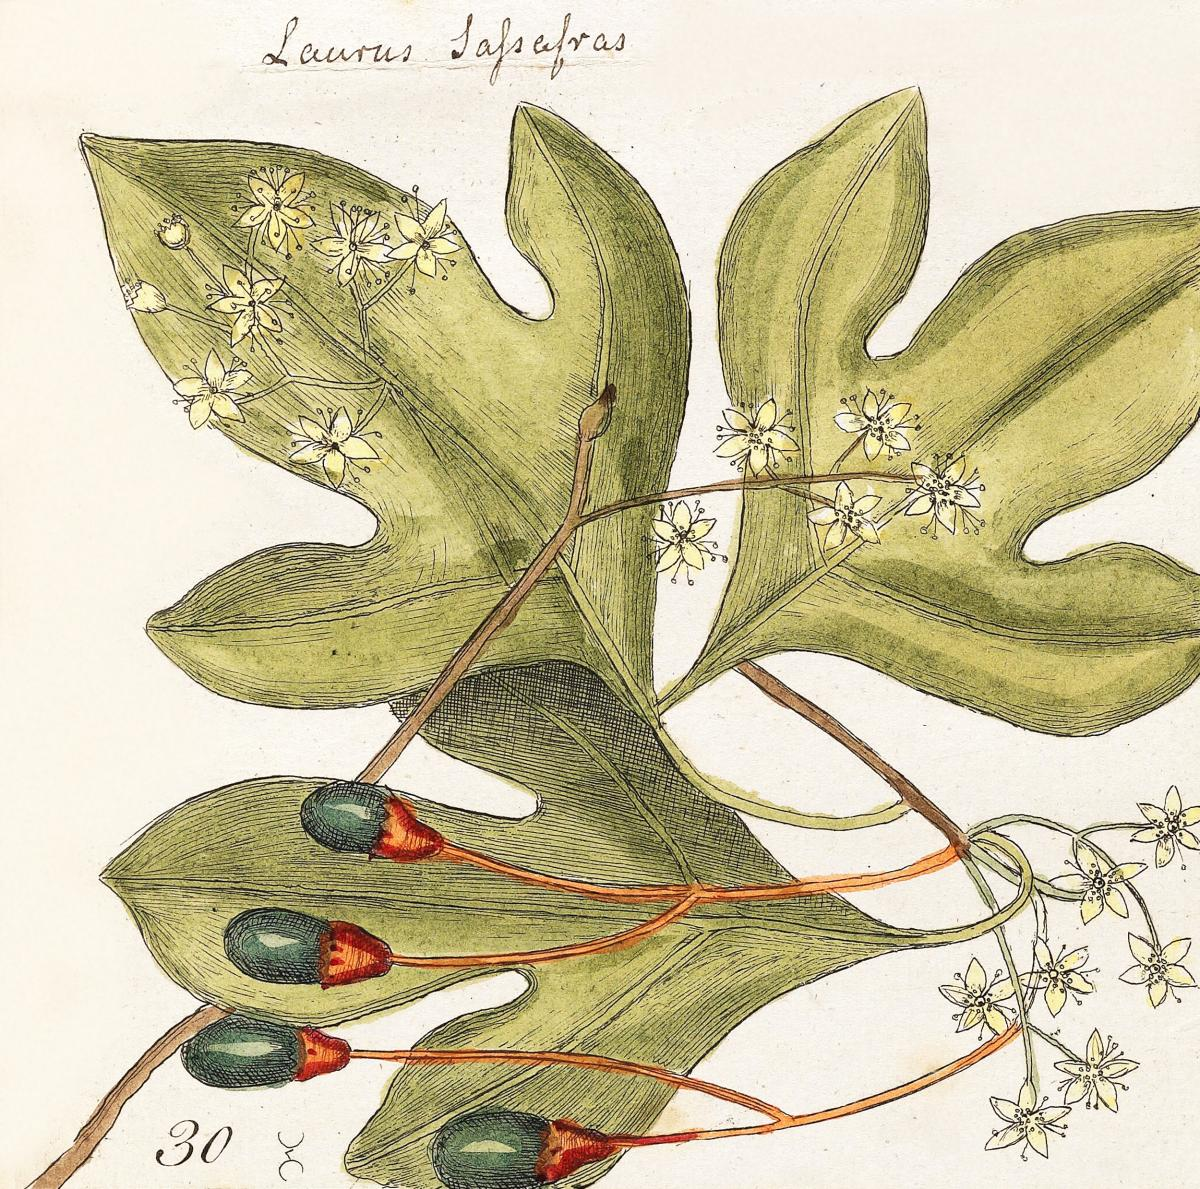 Tupelo Tree (Arbor in aqua nafeens) , Red Bay (Laurus Carolinenfis), Purple-berried Bay (Liguftrum Lauri folio), Saffafras Tree (Cornus Mas odorato) from The Natural History of Carolina, Florida, and the Bahama Islands (1754) by Mark Catesby (1683-1749).  #396603